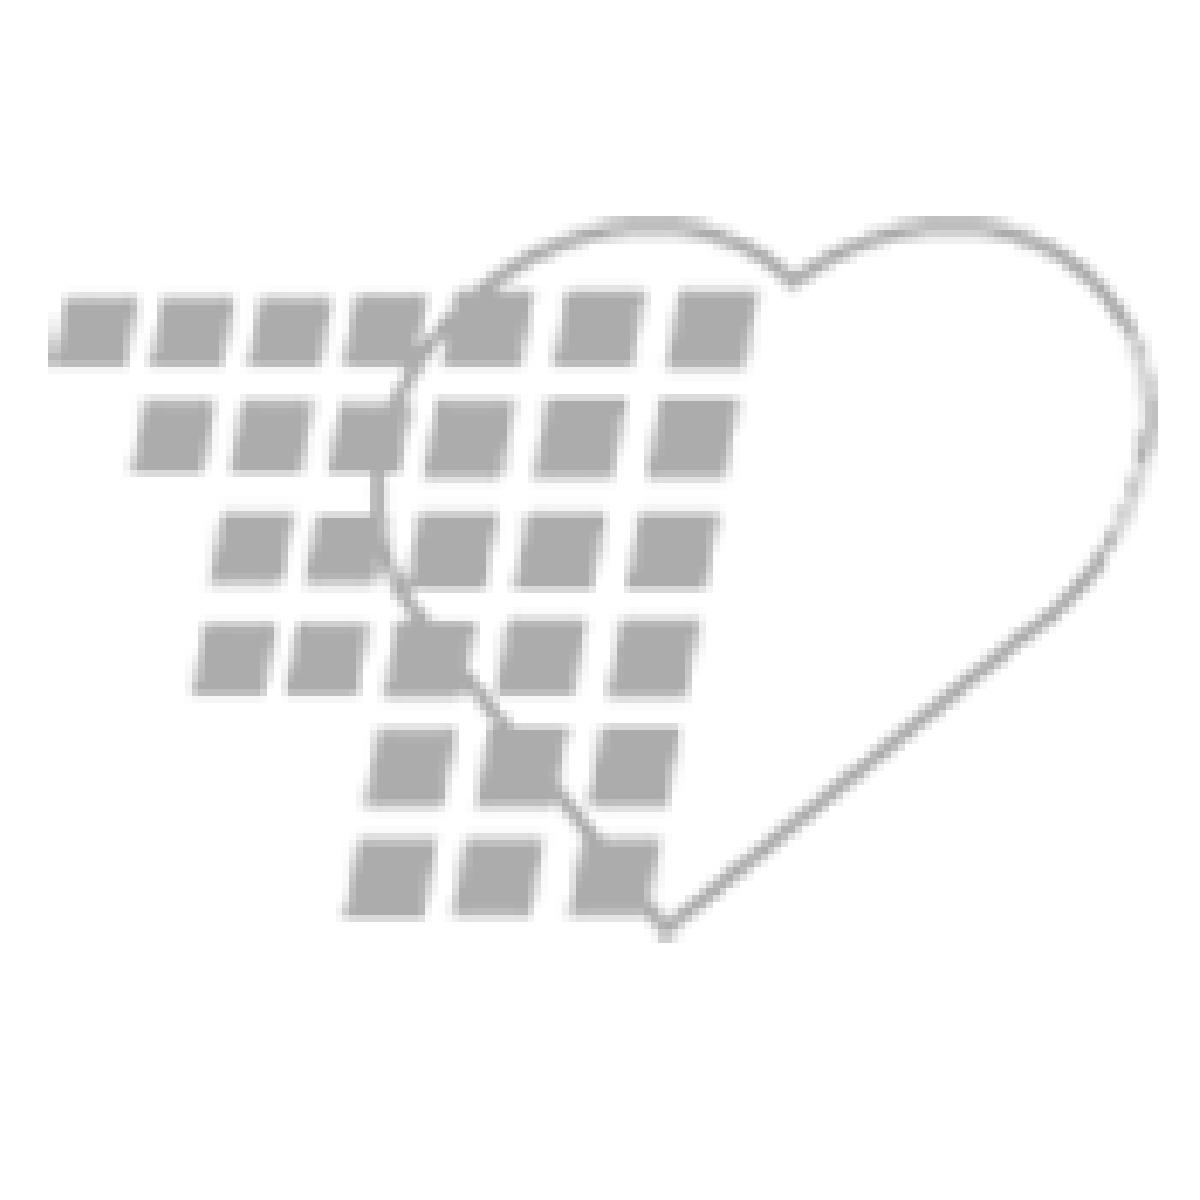 03-78-4010 Sharps-A-Gator™ Tortuous Path Sharps Container - 5 Quart